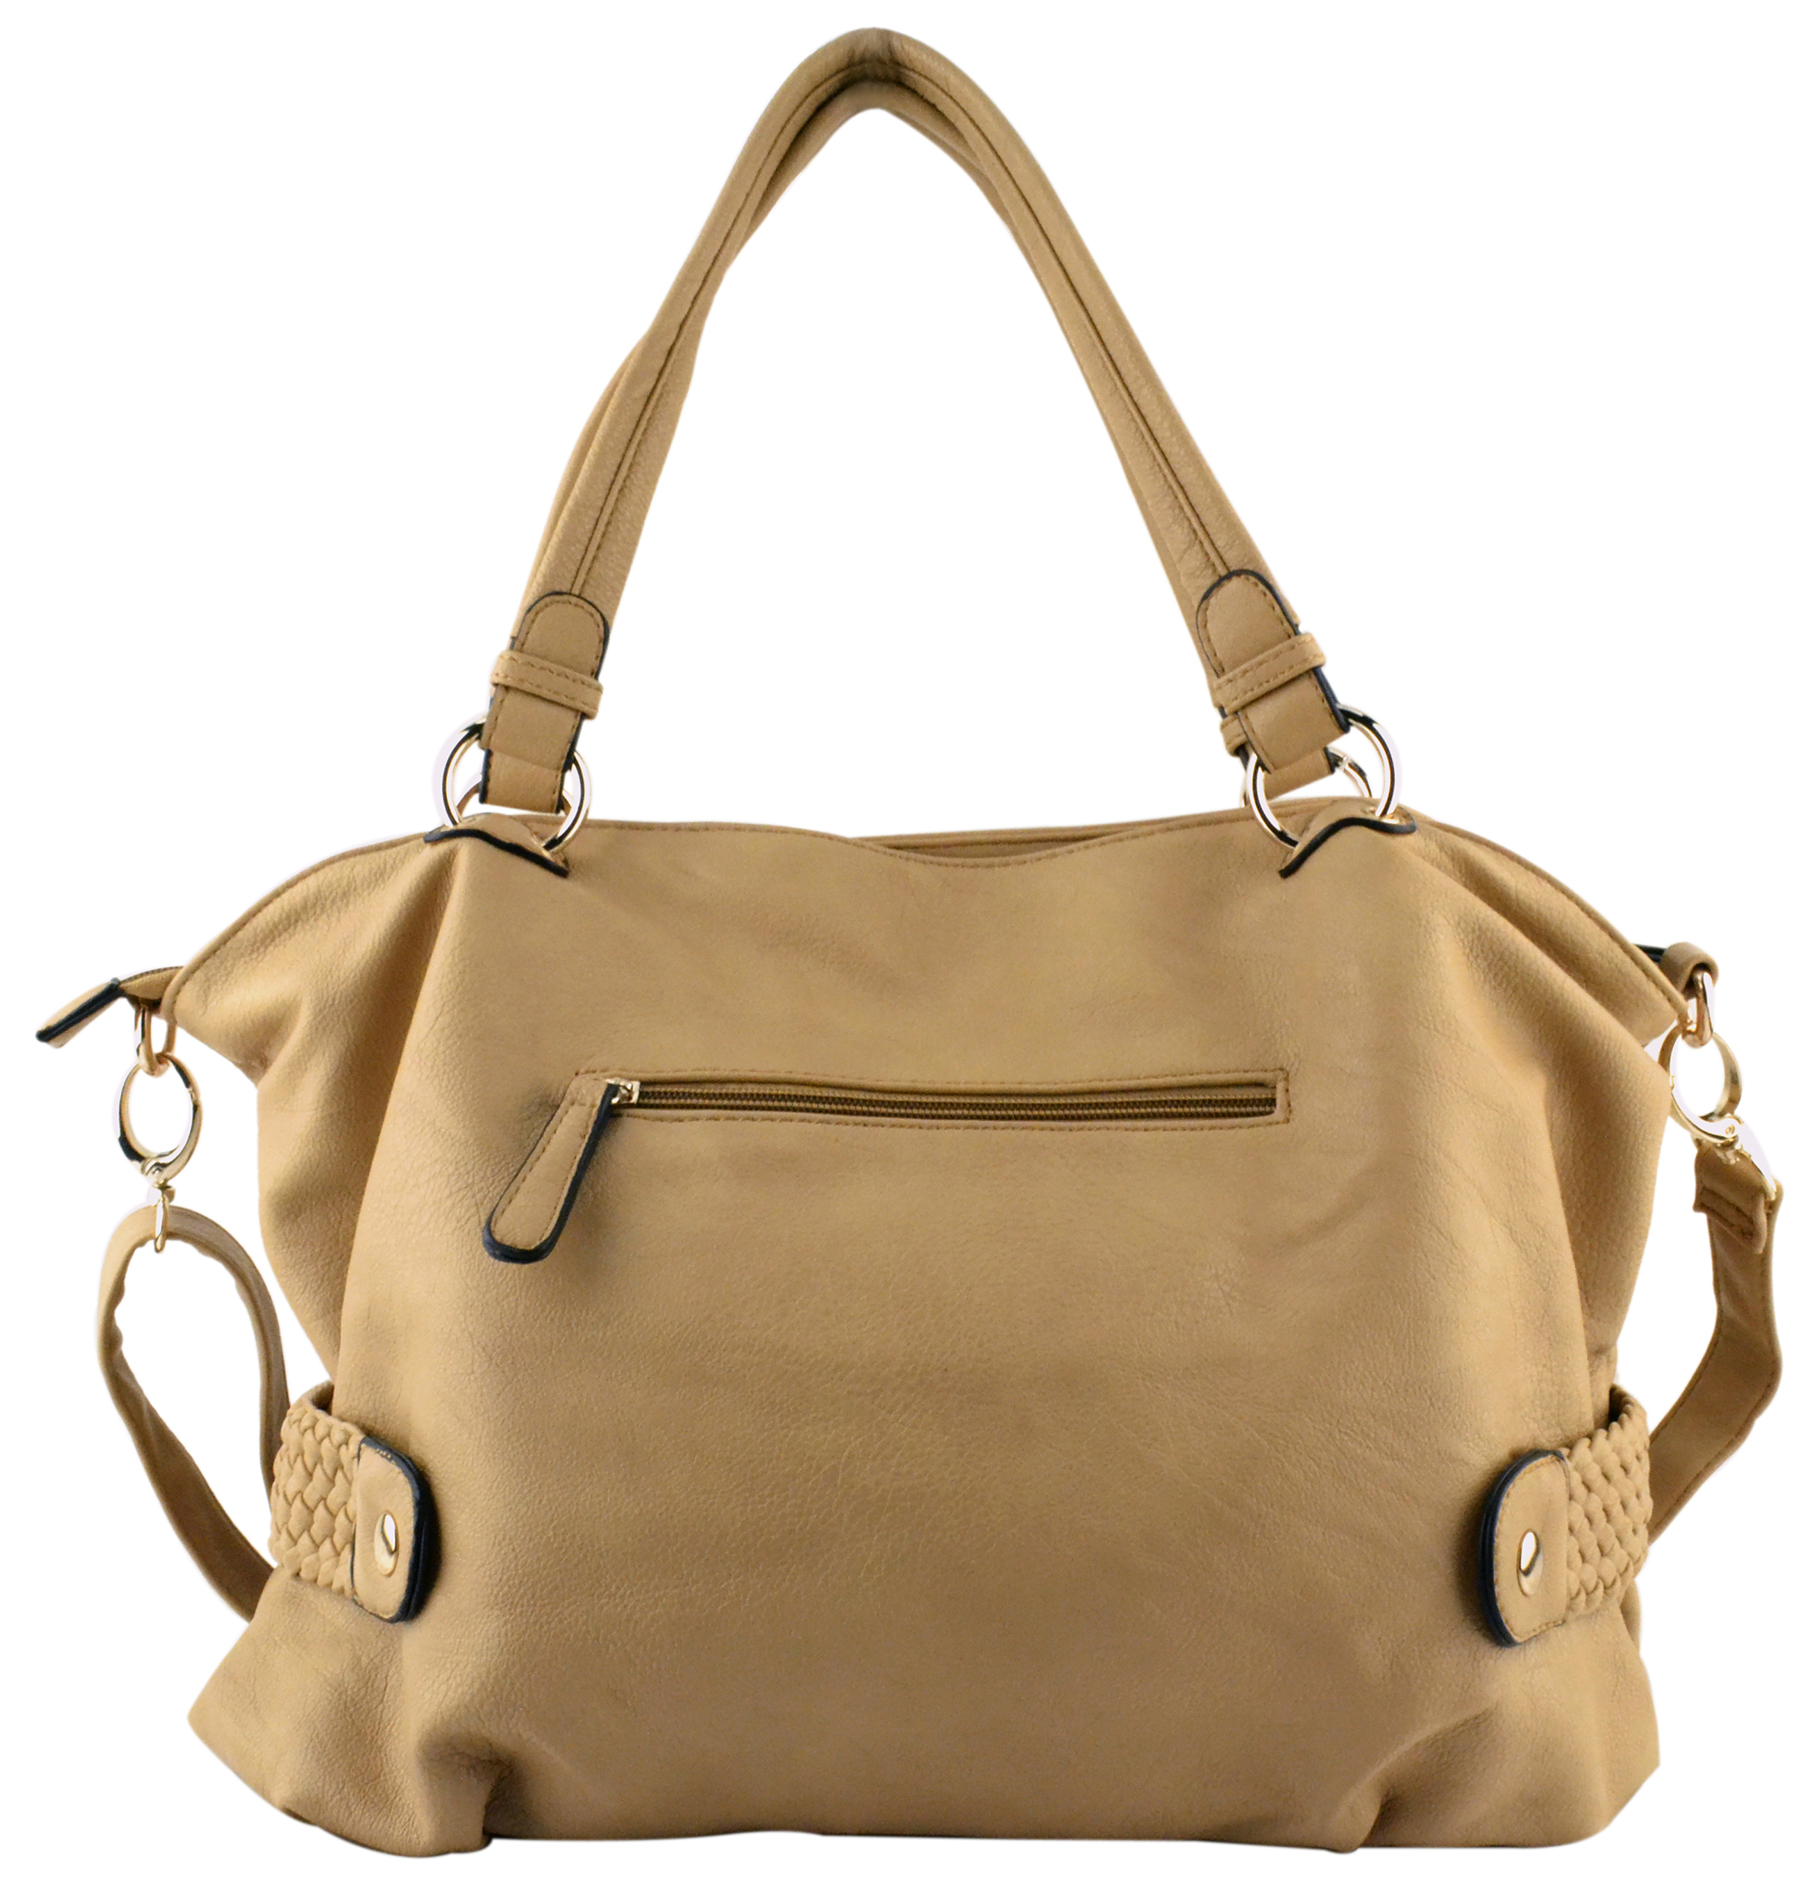 SAMANTHA Beige Soft Hobo Handbag 2